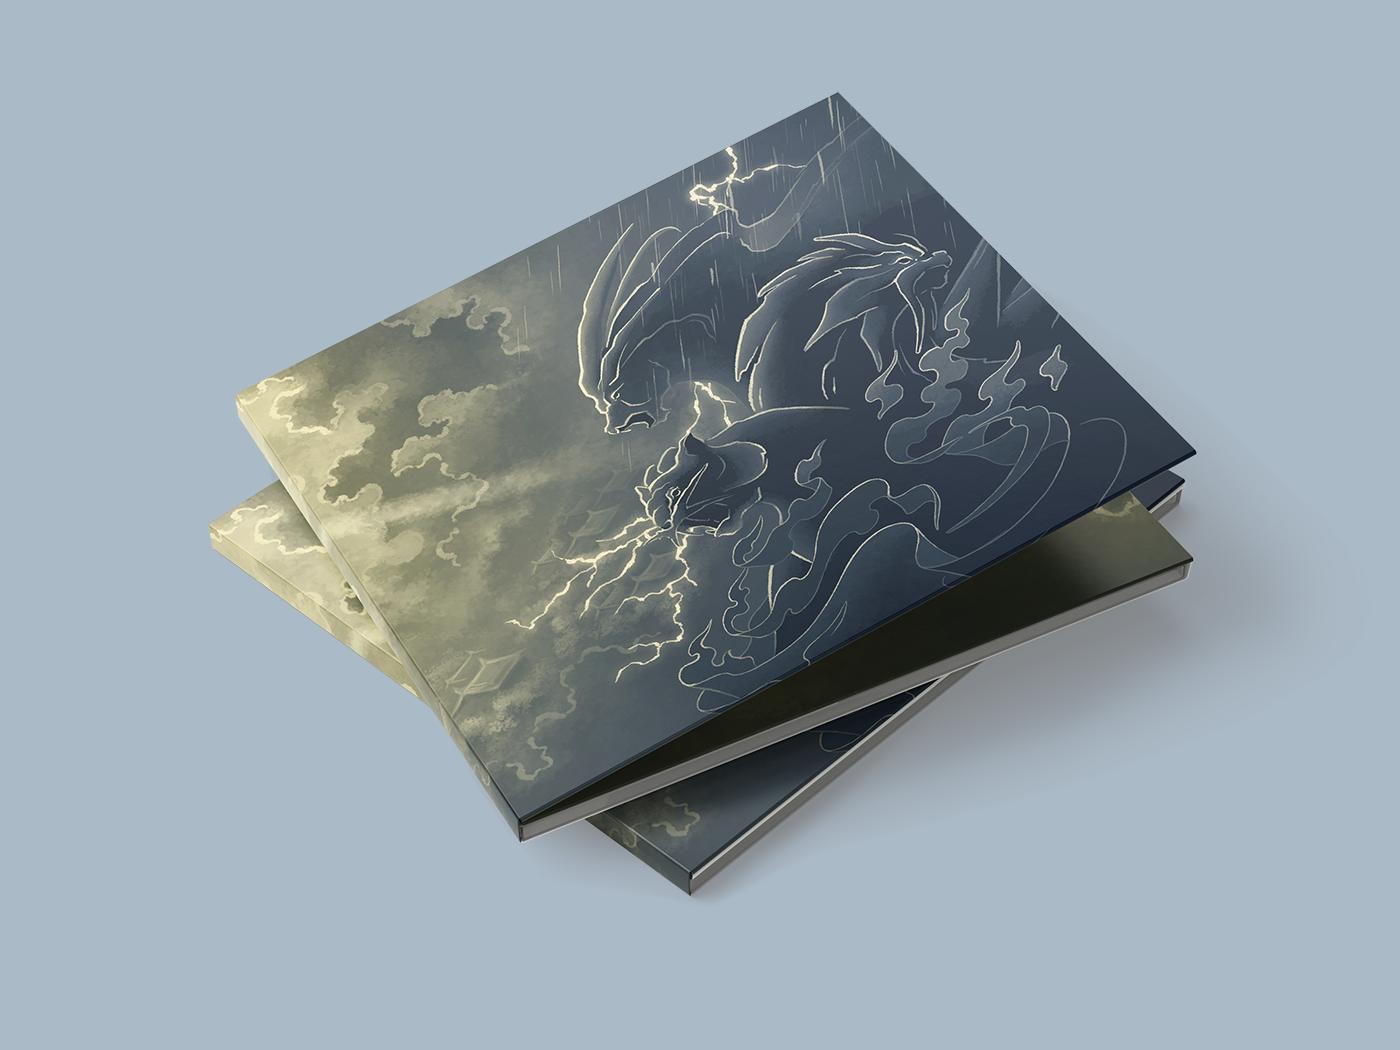 Gaming music cd fanart ornamental Packaging gold blue creatures monster